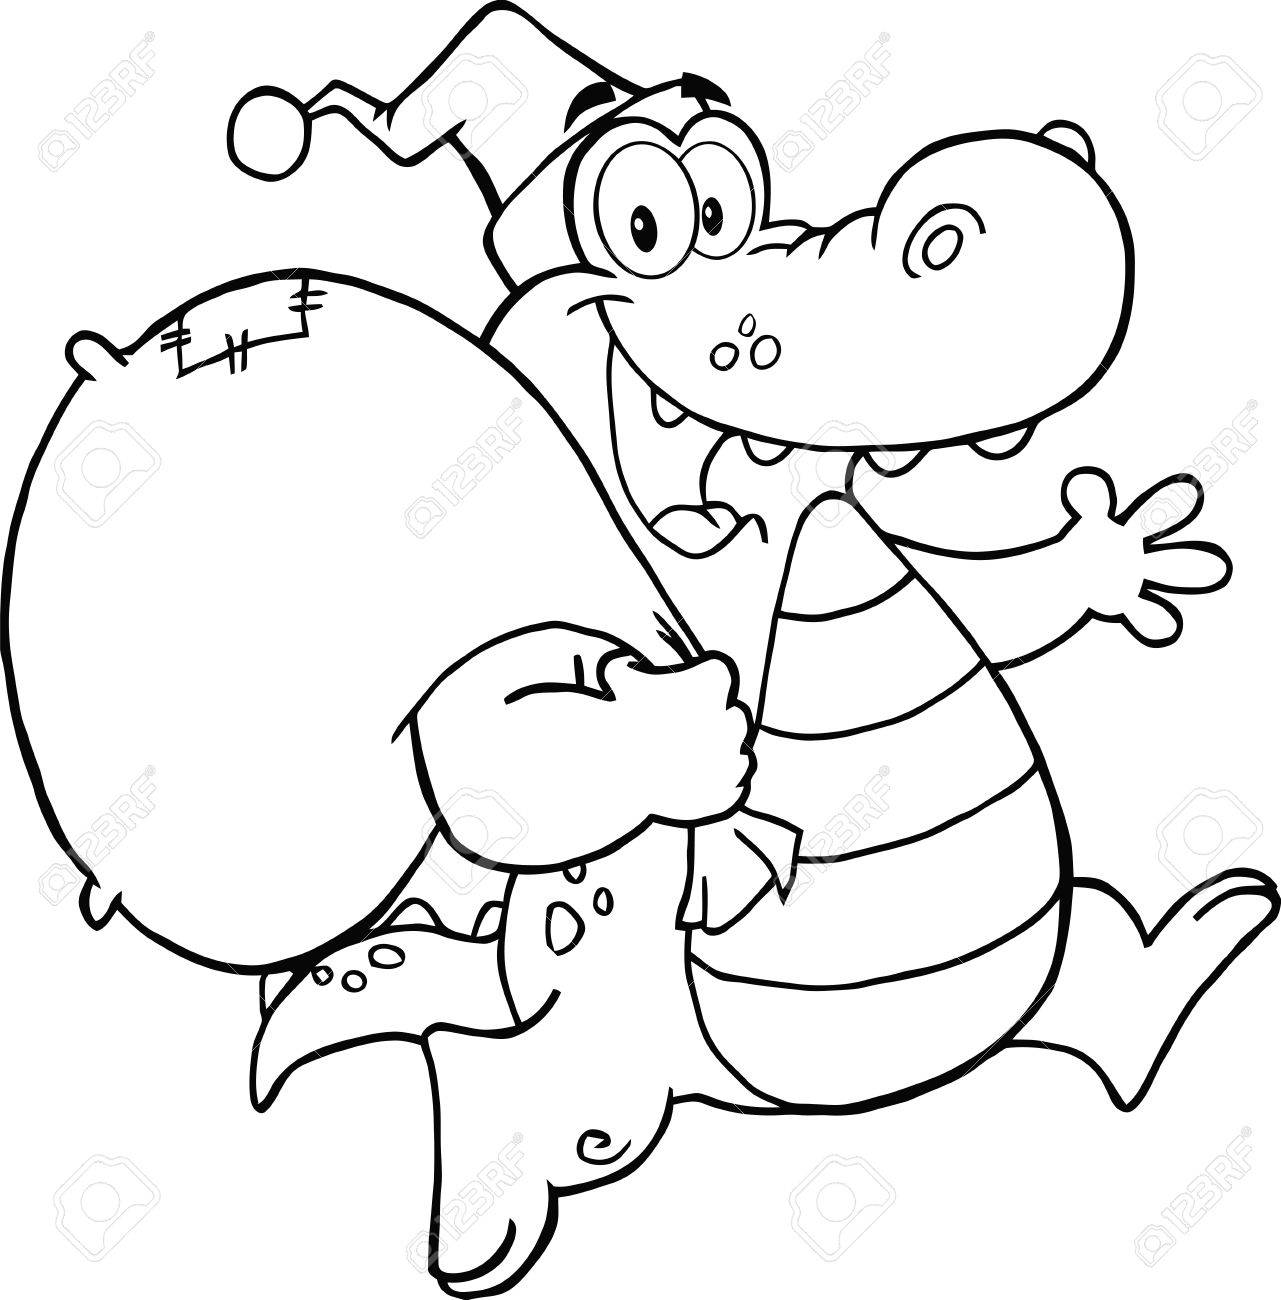 Black And White Crocodile Santa Cartoon Mascot Character Running ... for Clipart Crocodile Black And White  570bof